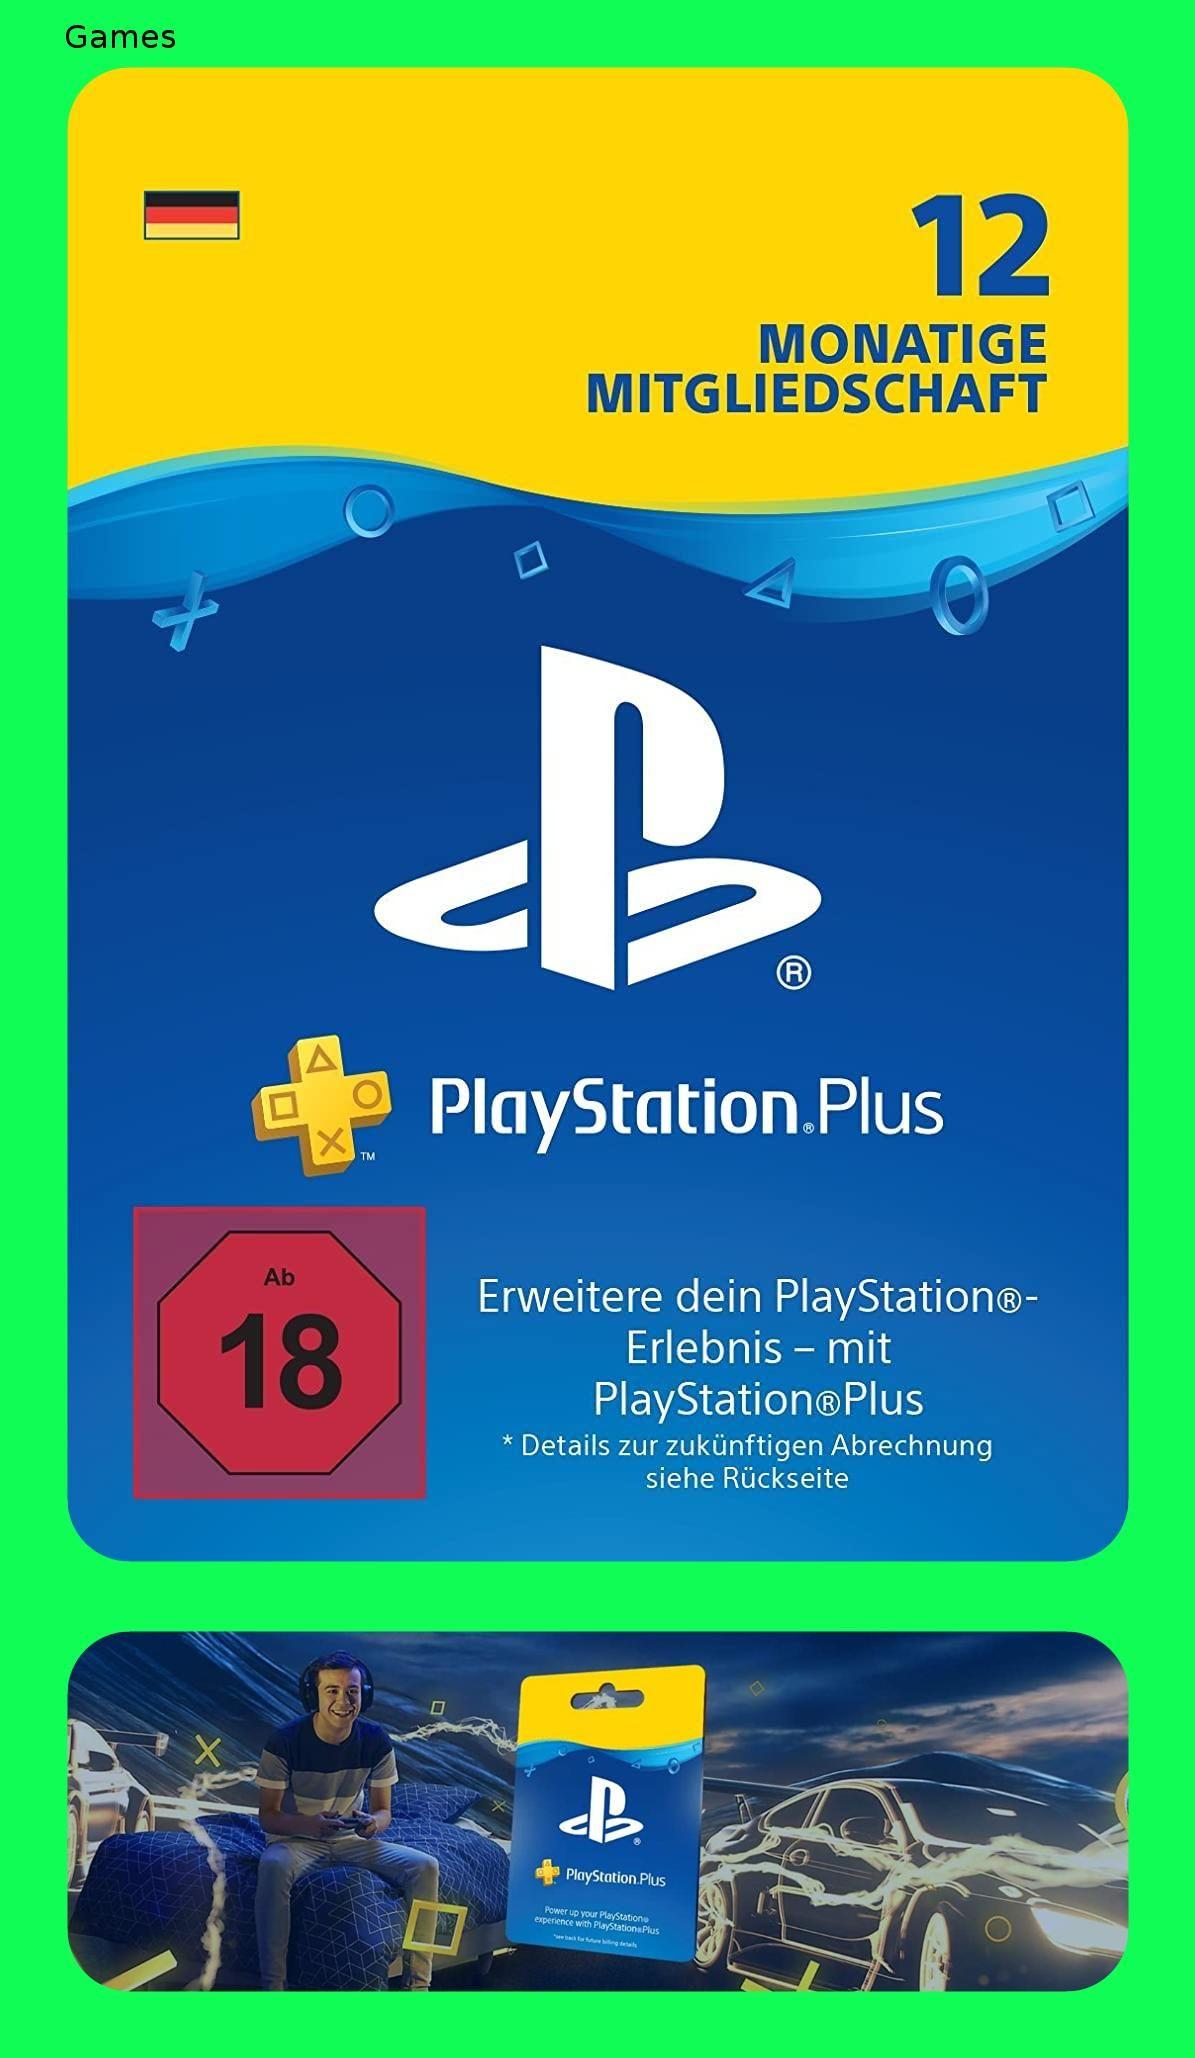 Playstation Plus Mitgliedschaft 12 Monate Ps4 Download Code Deutsches Konto Ps4 12 Code Deutsches Download Konto Playstation Spielesammlung Ps4